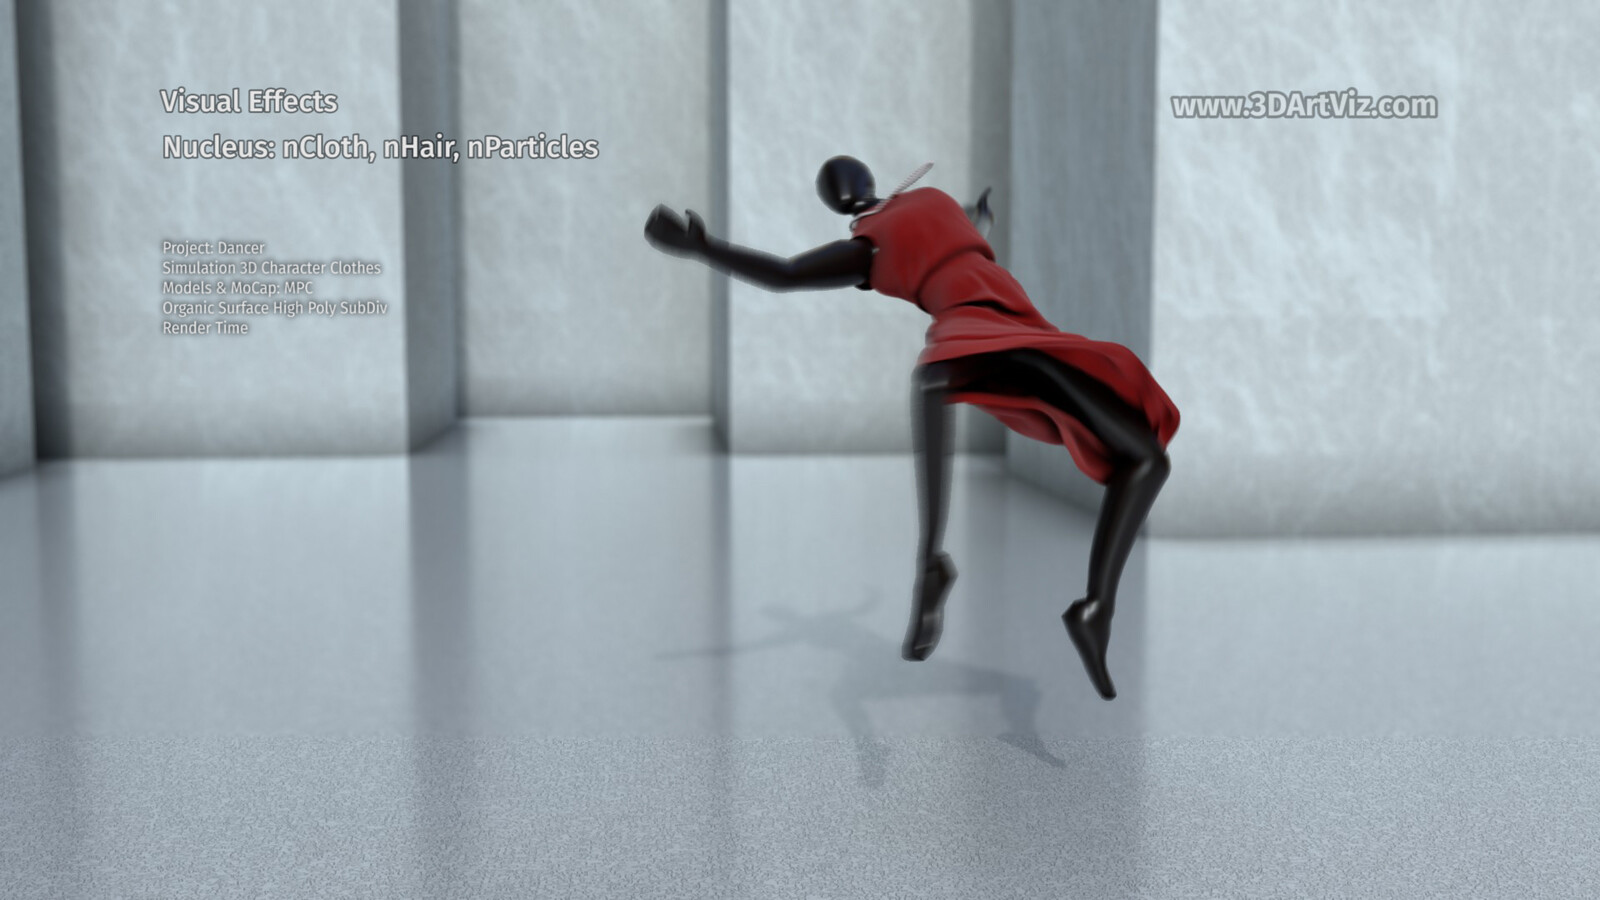 Dress Simulation Project: Dancer